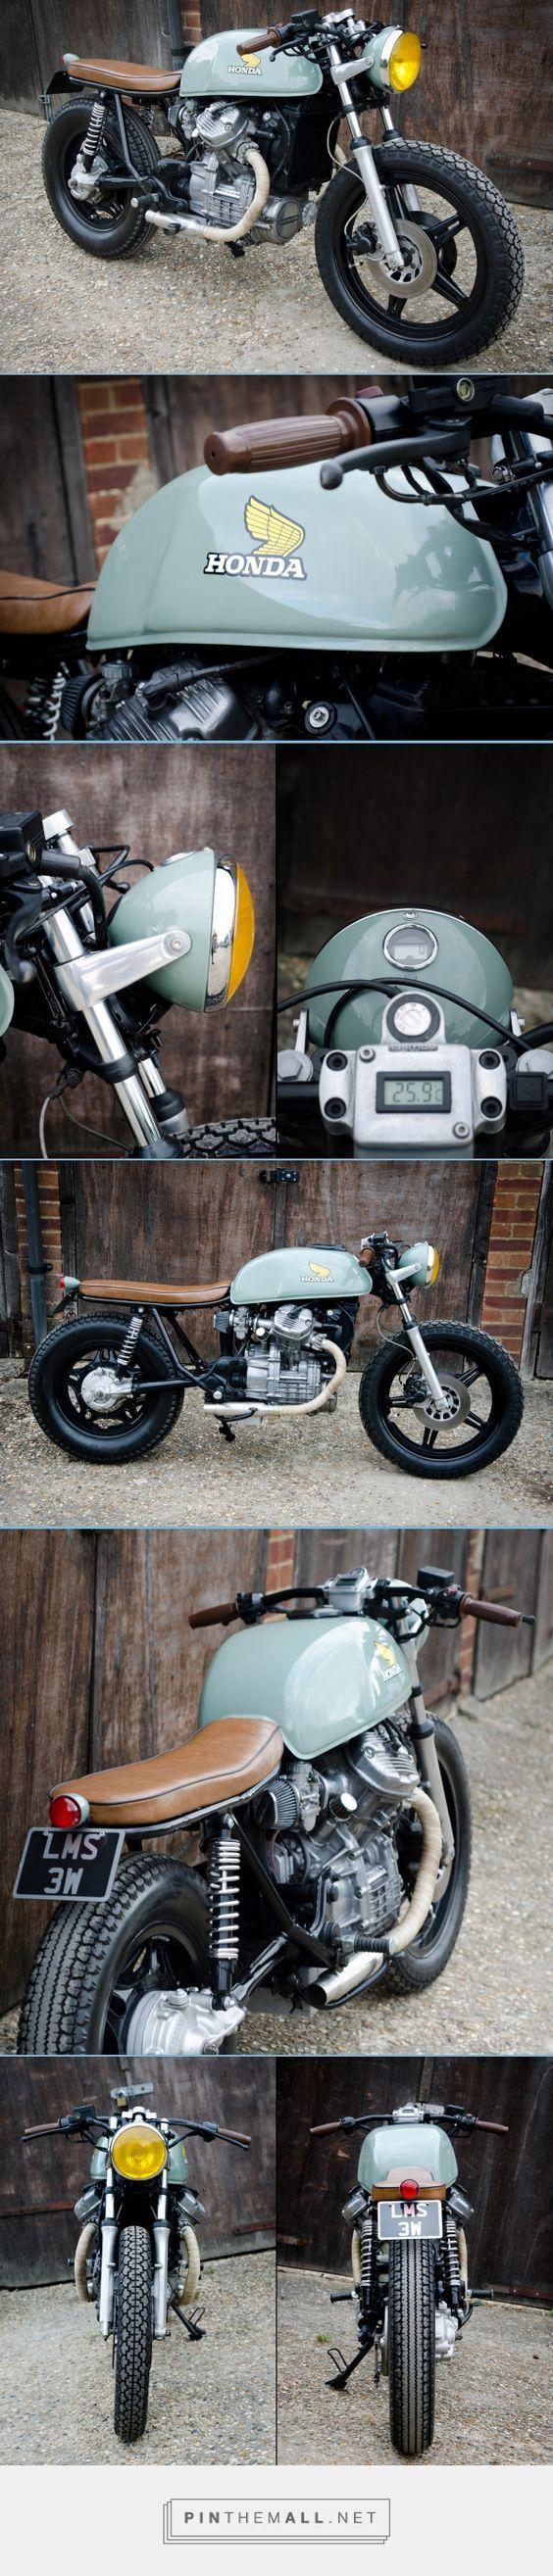 Yard Built Honda CX500 by Richard (London)